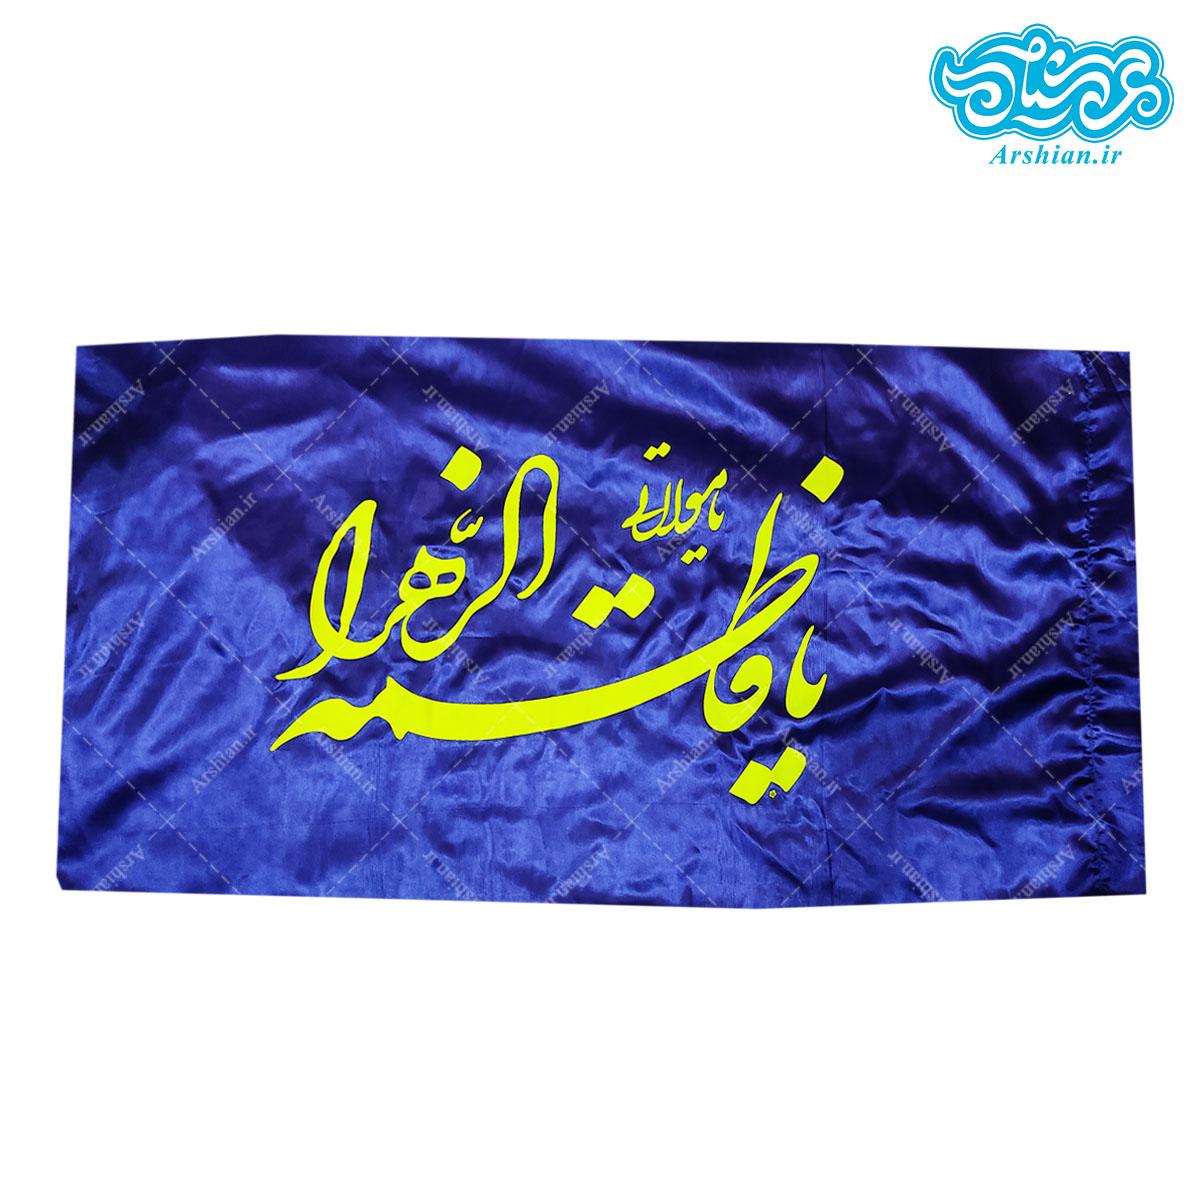 پرچم ساتن یافاطمه الزهرا کد020